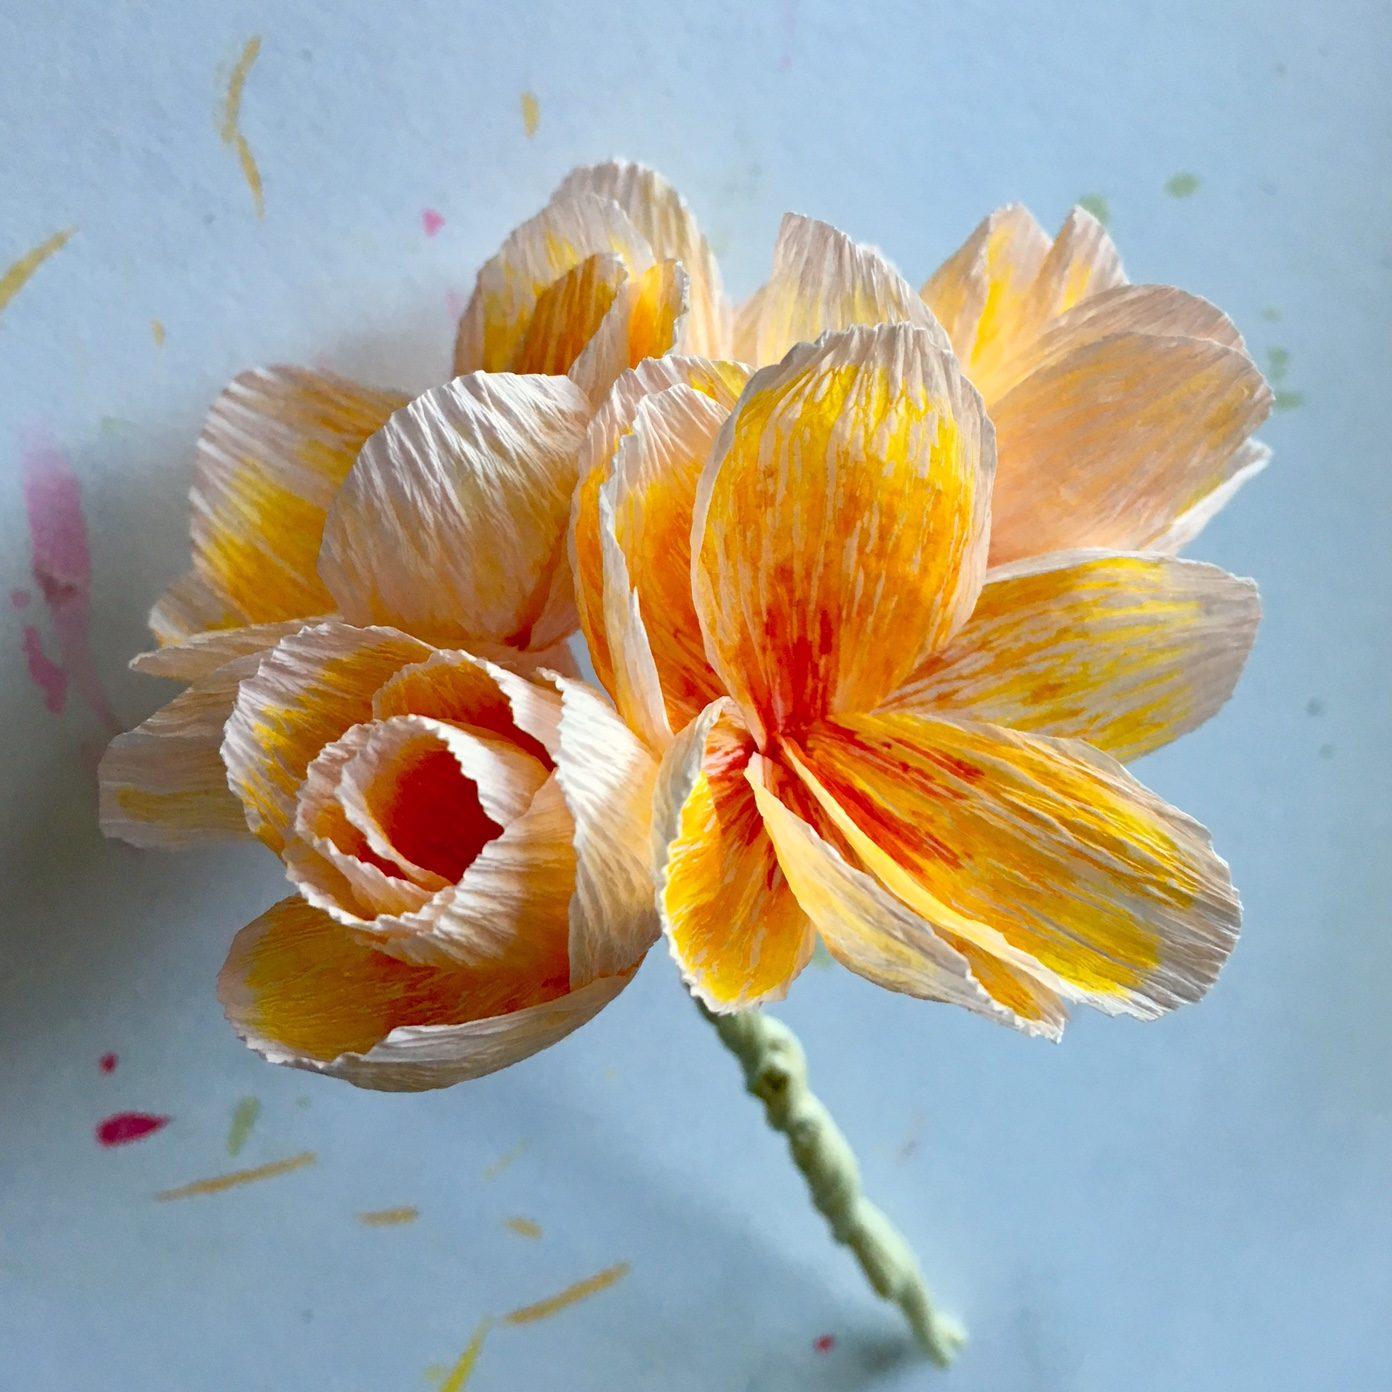 peper pelargonium flower head